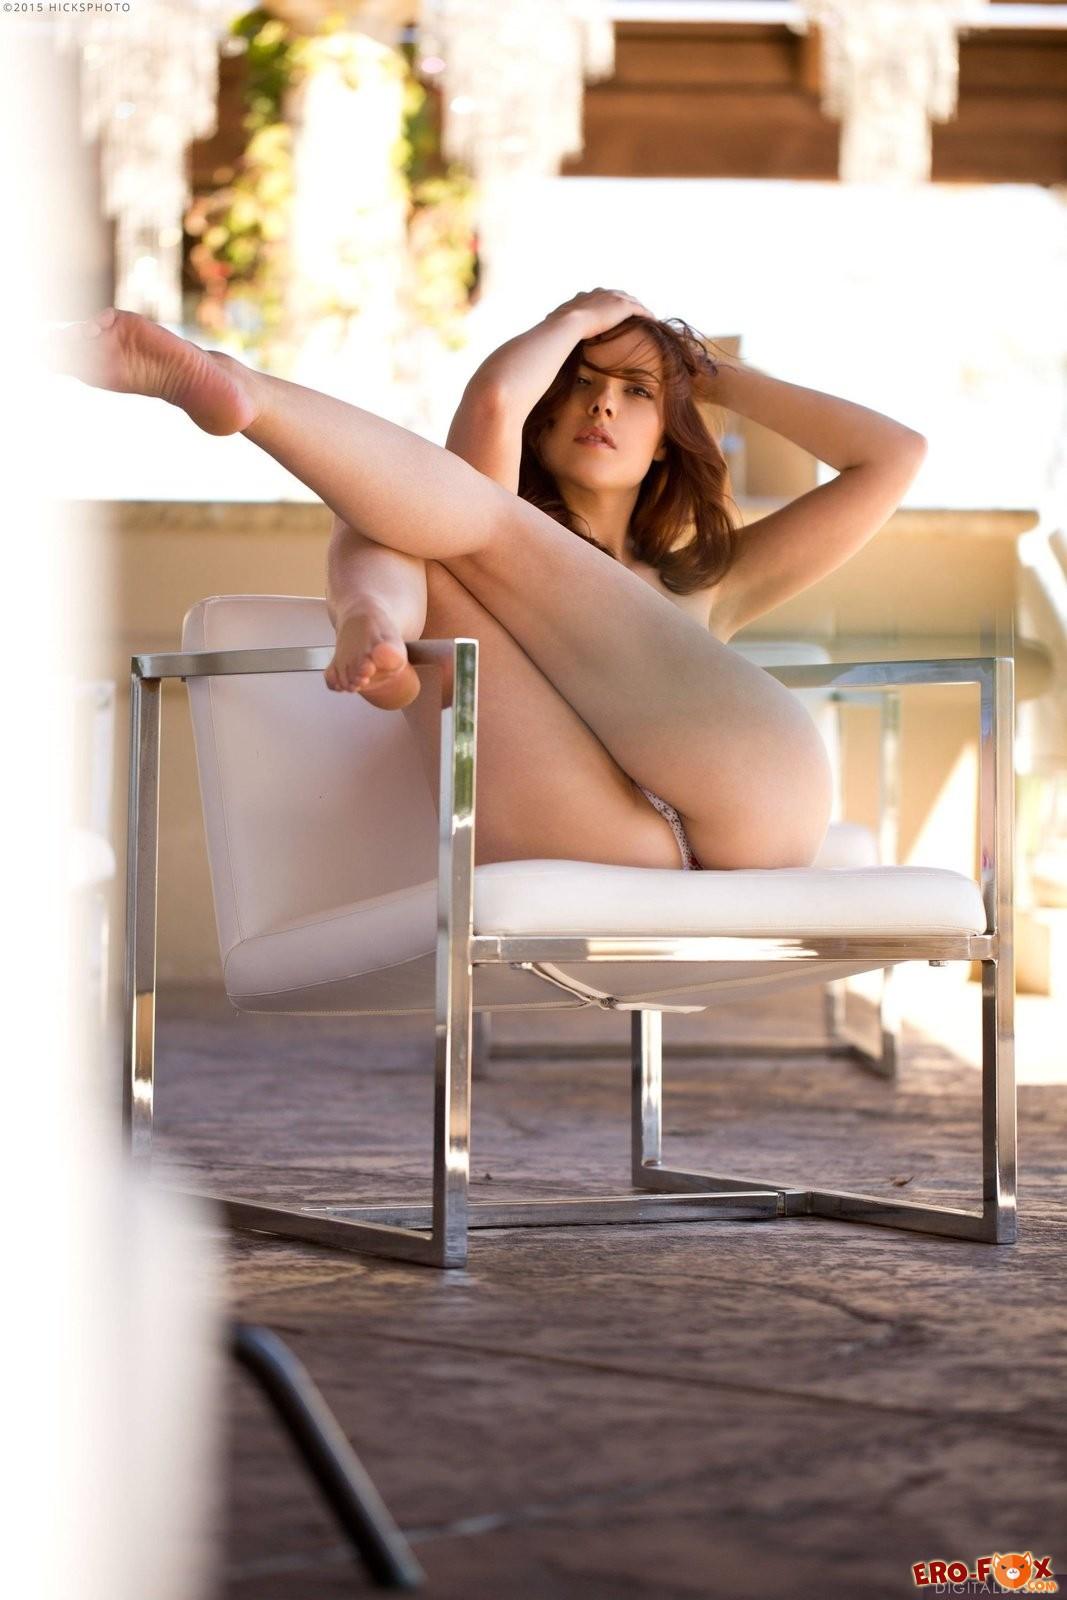 Девушка в майке без трусов, голая на диване .